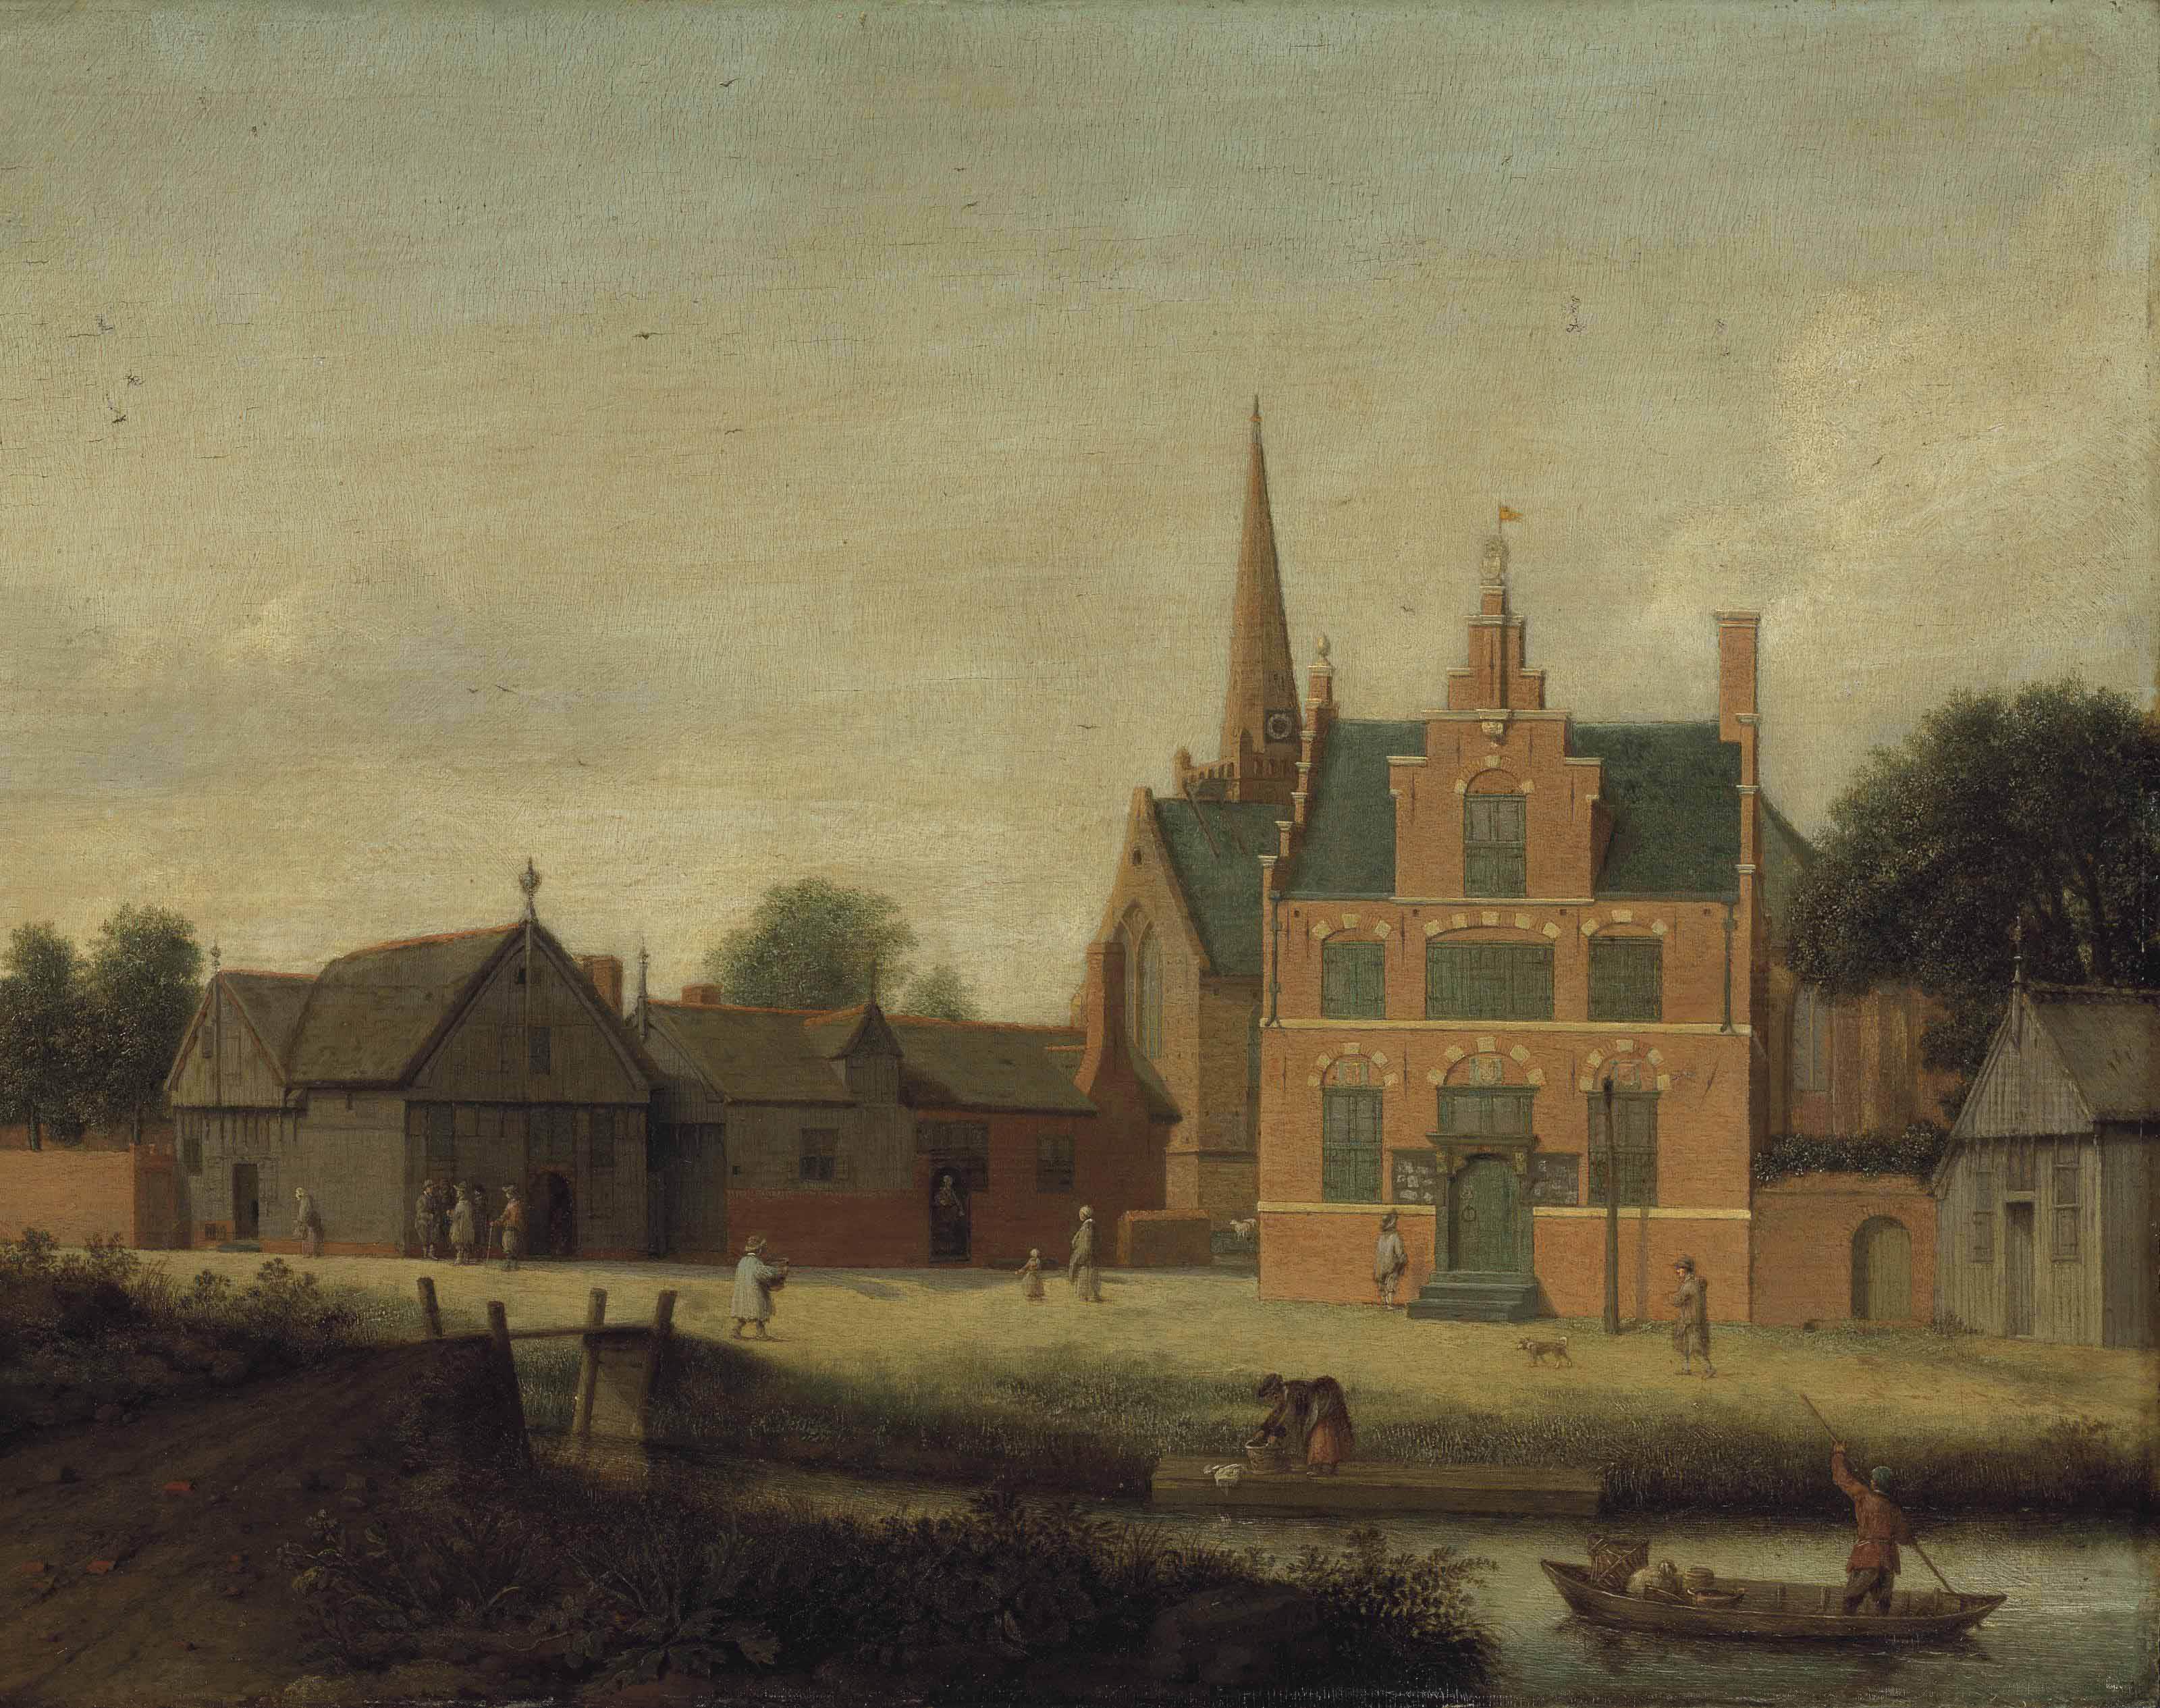 Pieter Jansz. Saenredam (Assendelft 1597-1665 Haarlem)